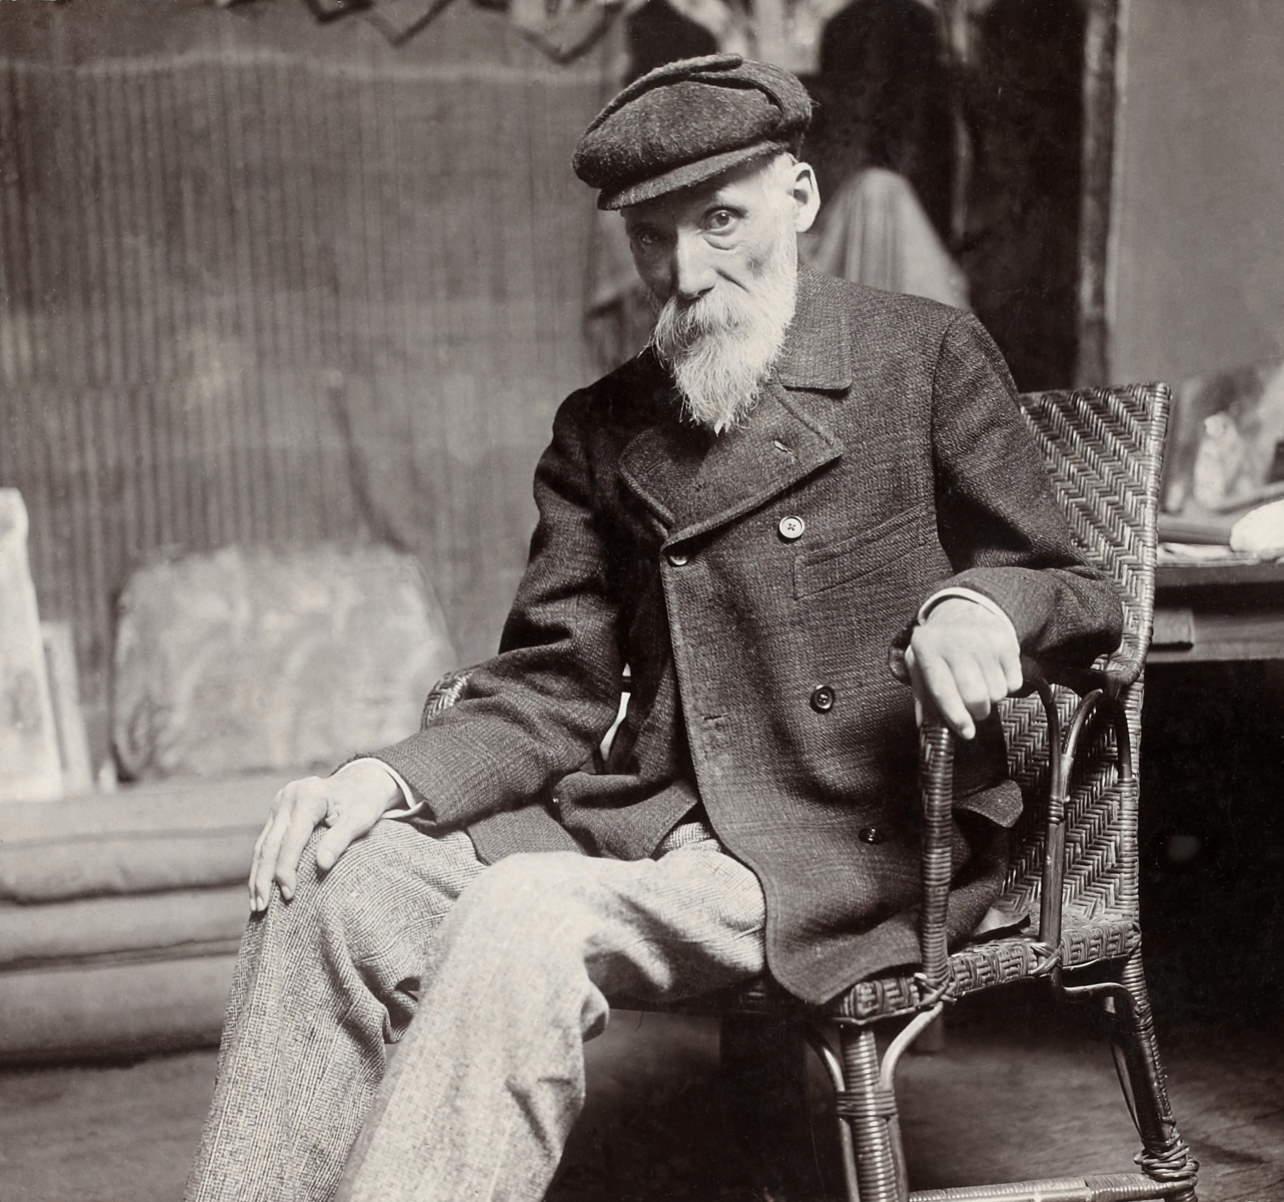 Pierre-Auguste Renoir (1841–1919), french painter